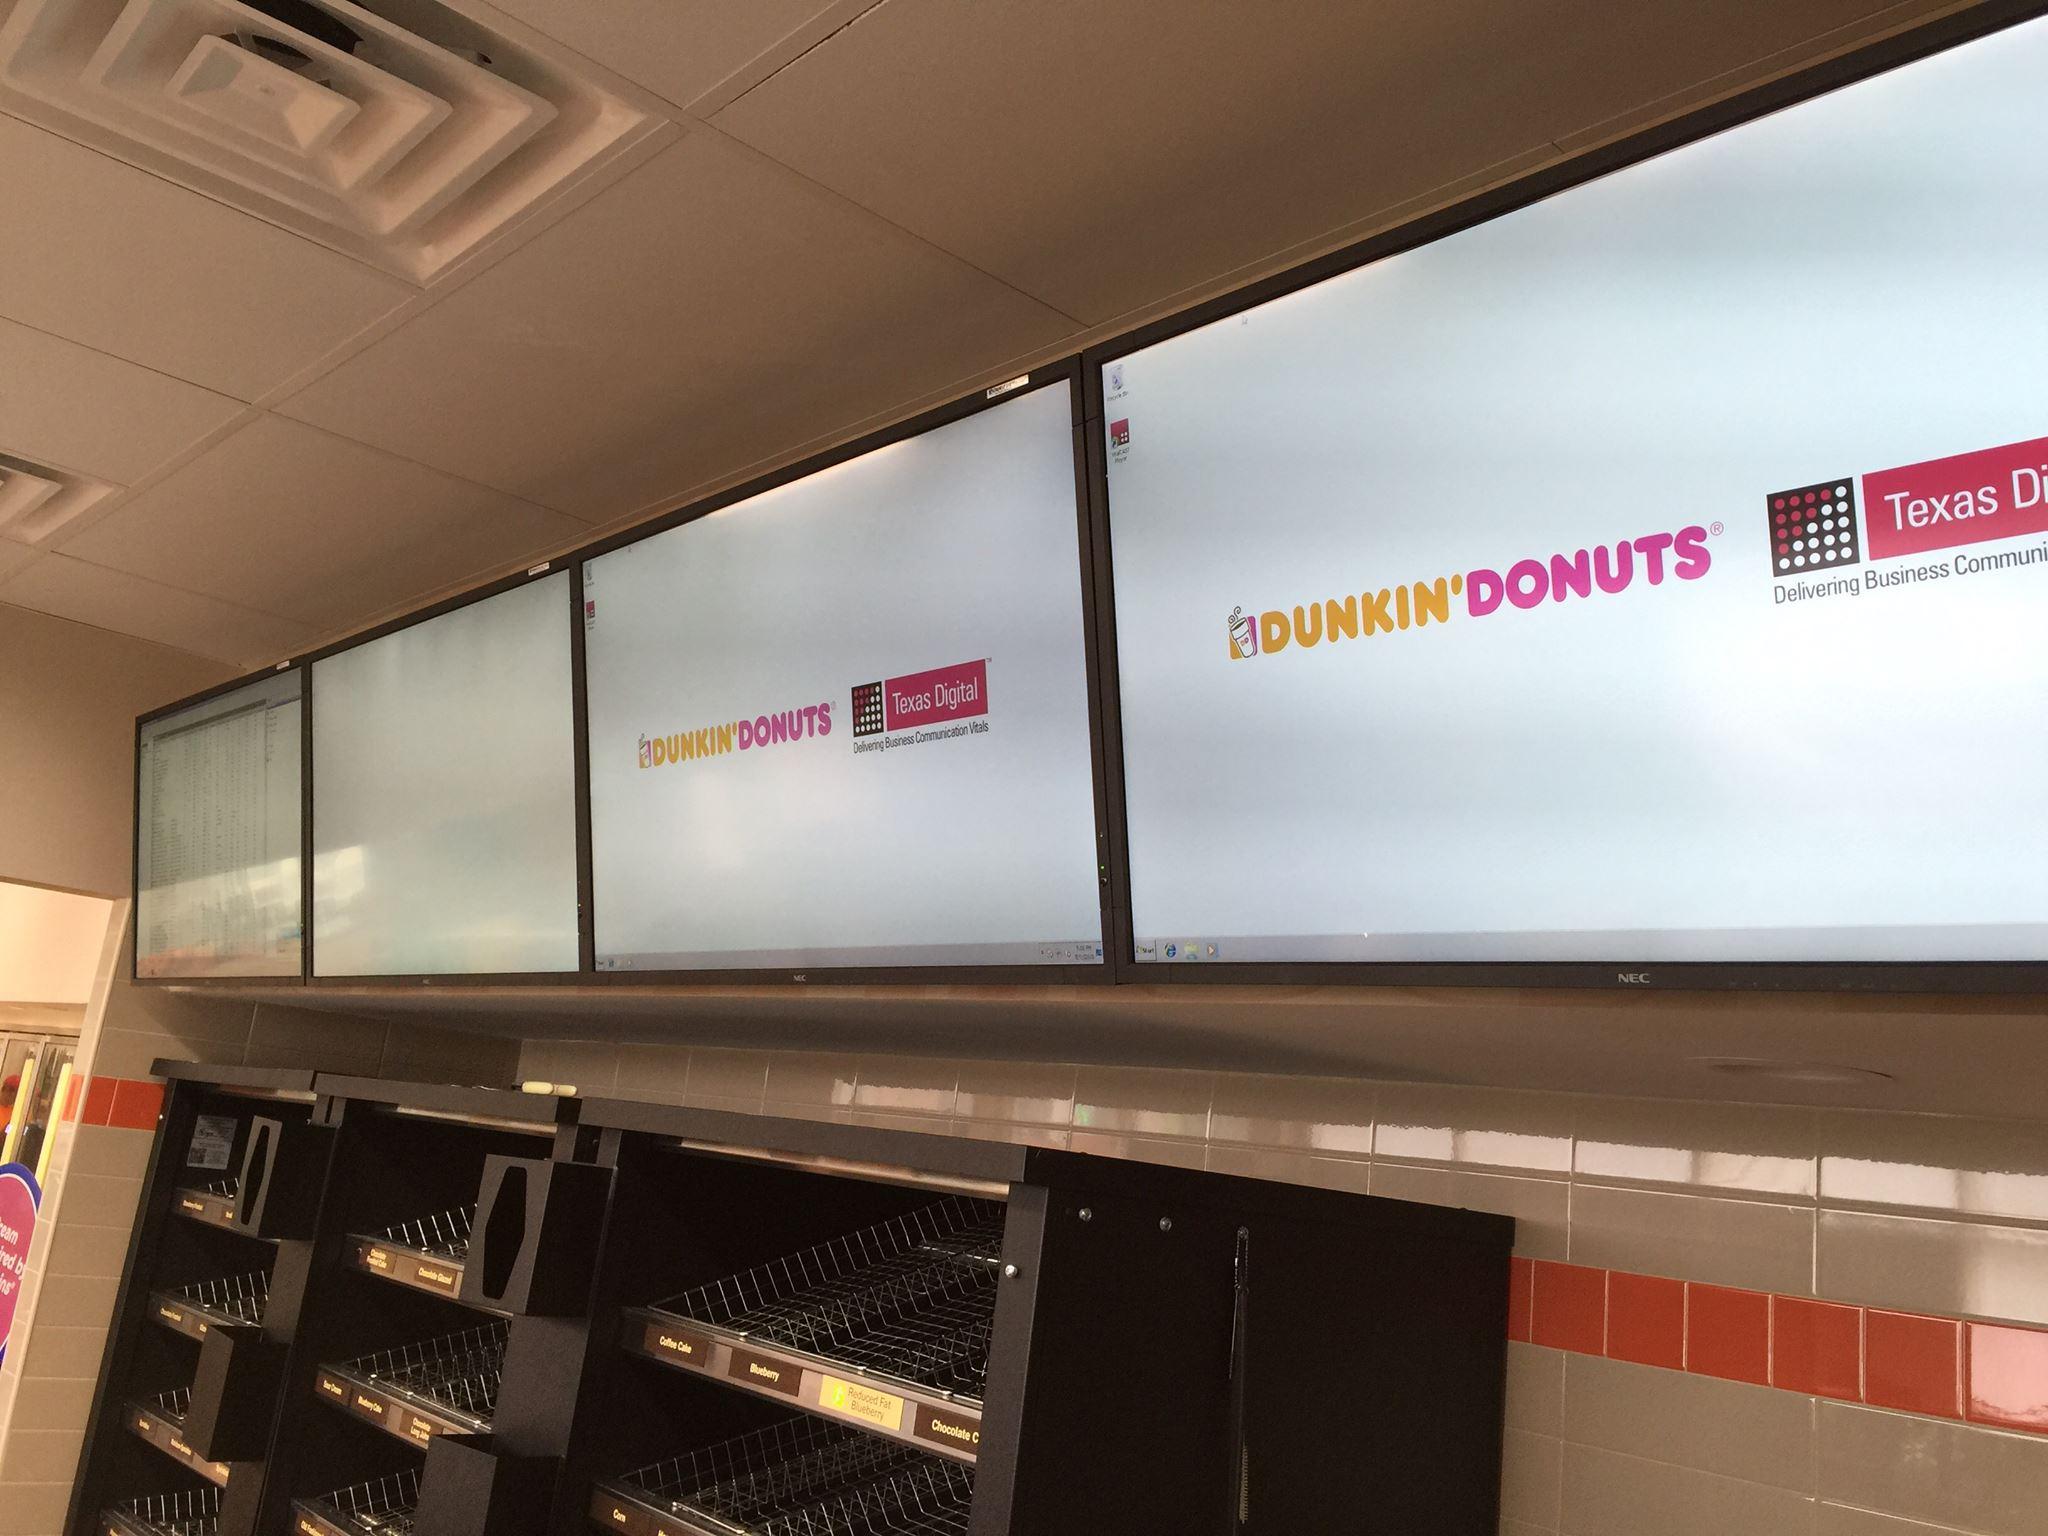 Dunkin Donuts Menu Board